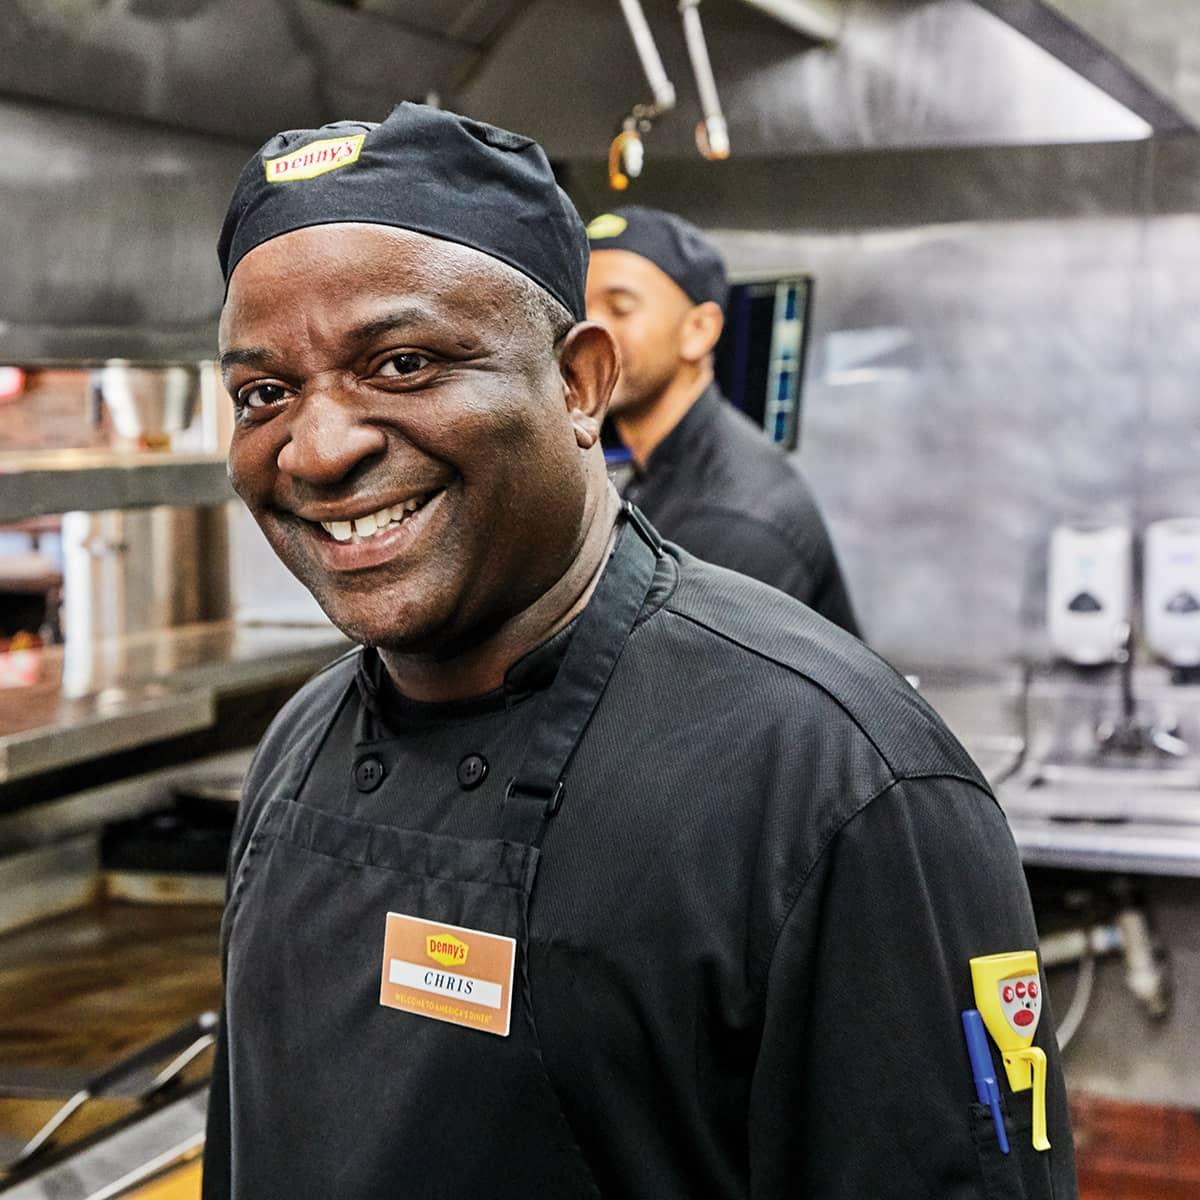 Smiling Denny's Chef